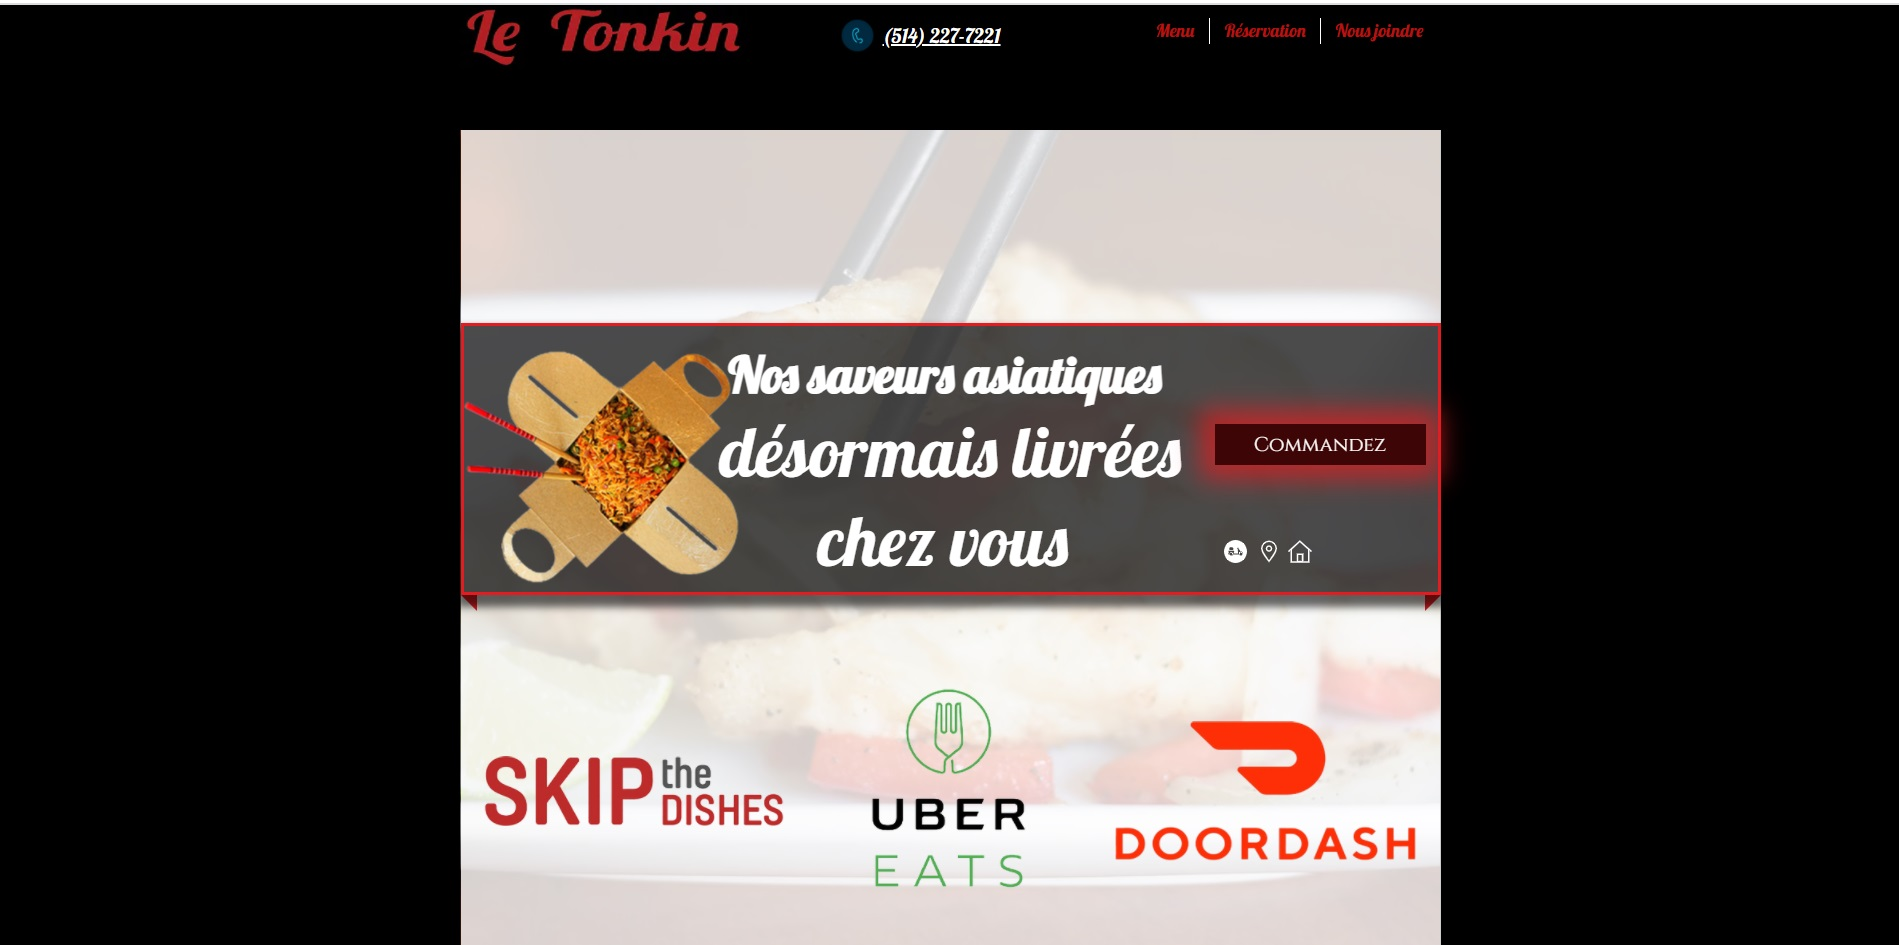 Restaurant Le Tonkin